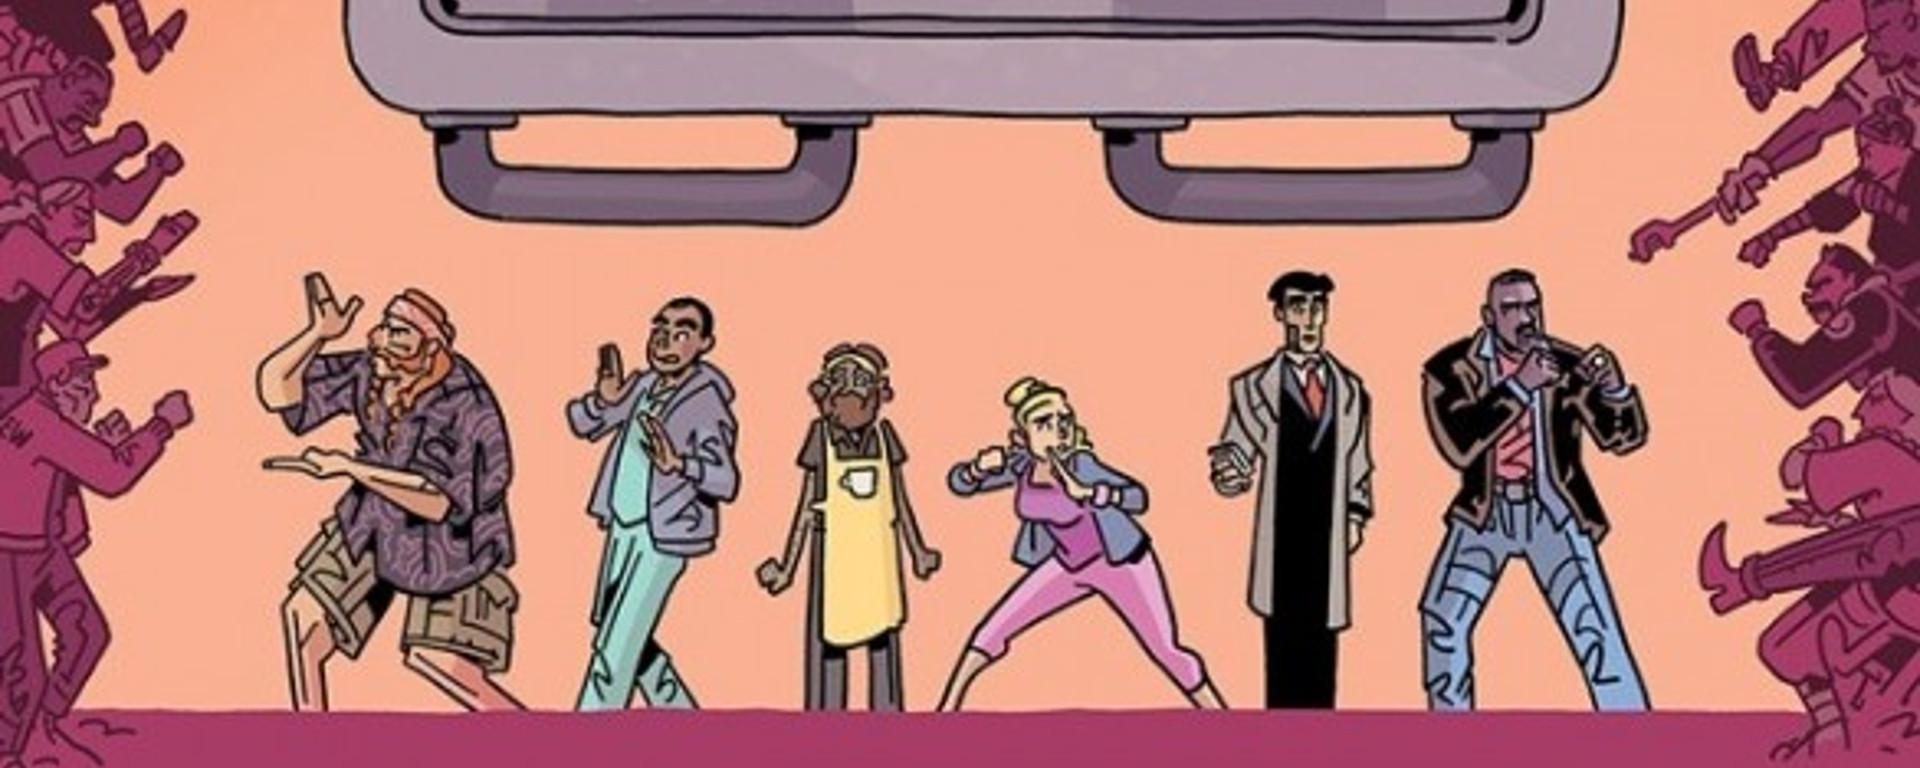 The Six Sidekicks of Trigger Keaton #1 Header